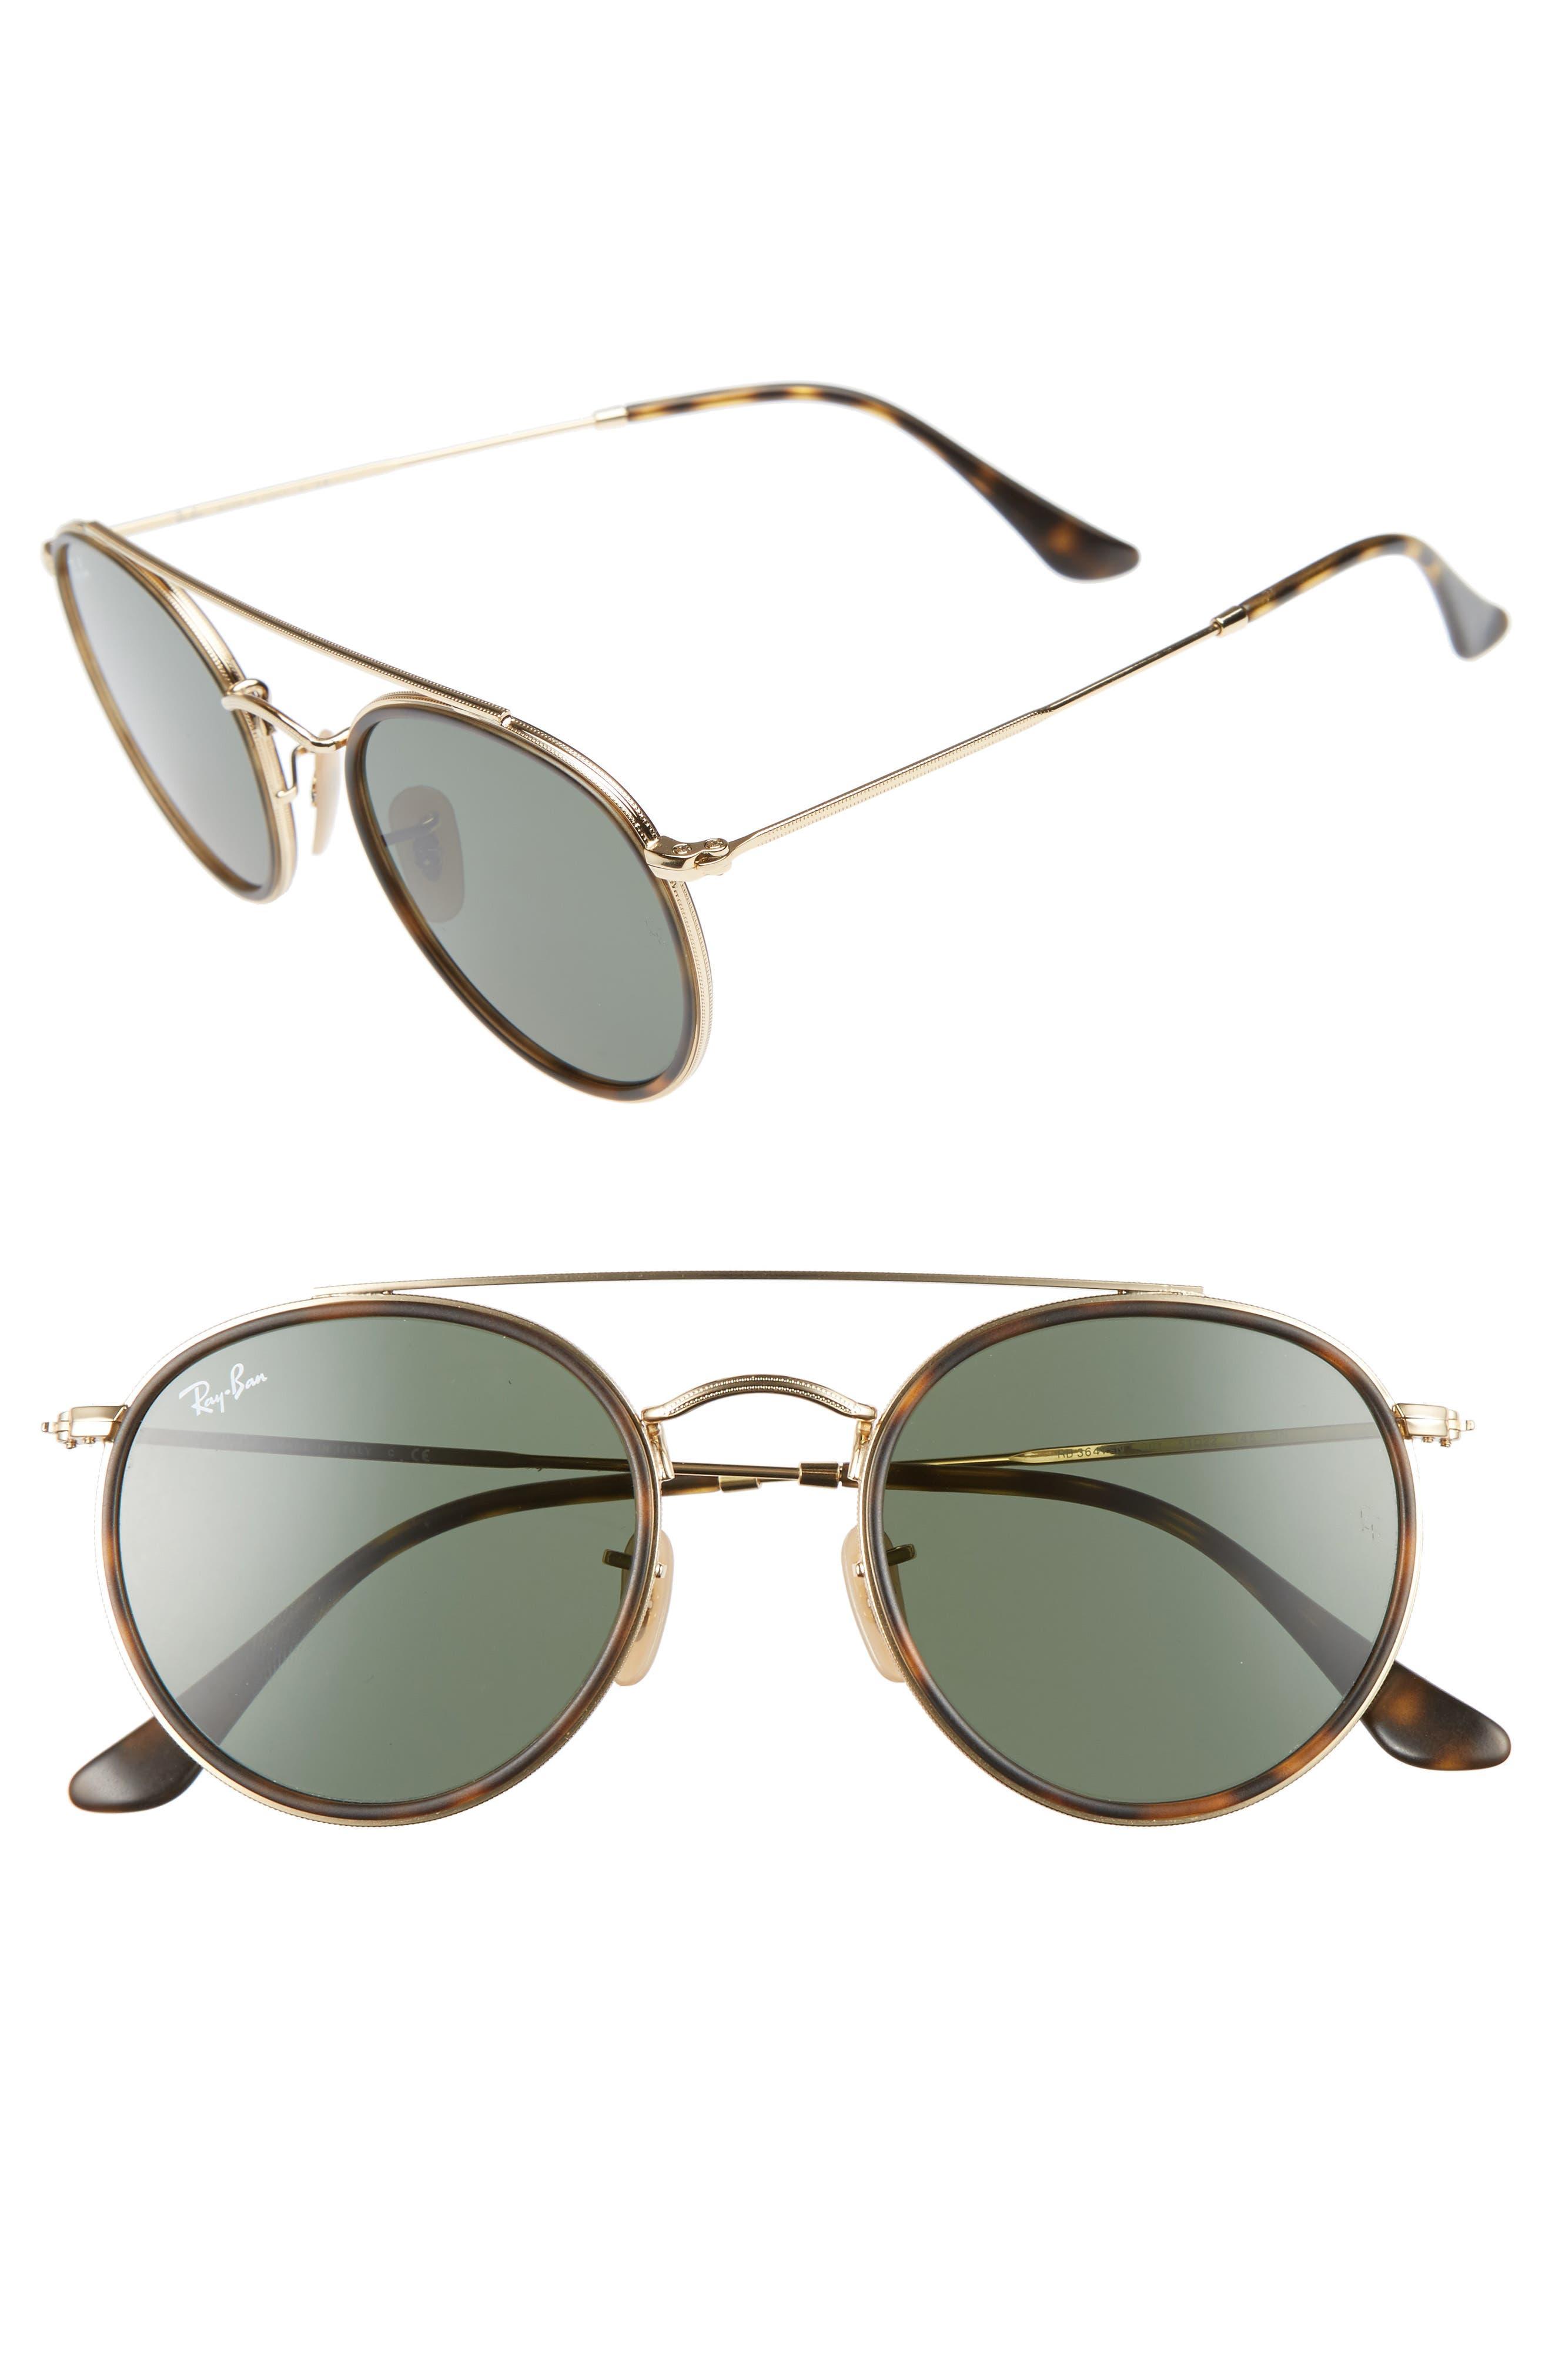 Ray-Ban 51Mm Aviator Sunglasses - Gold/ Green